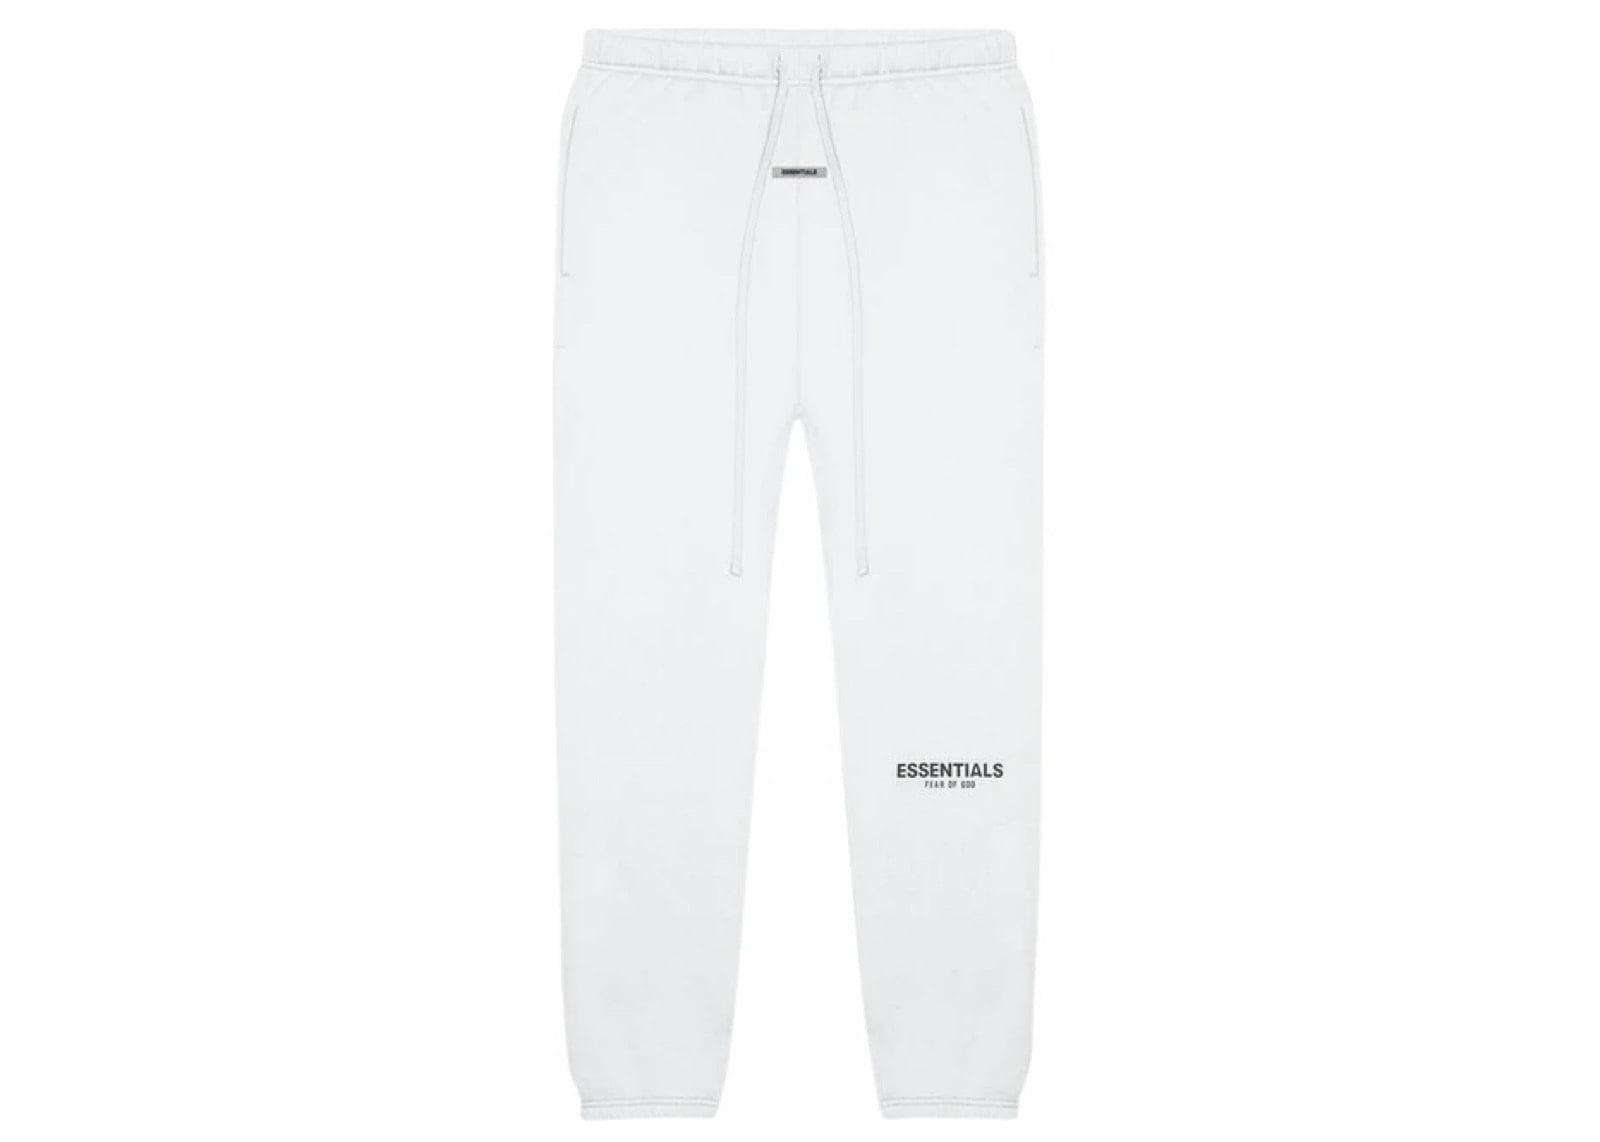 slide 1 - White Sweatpants